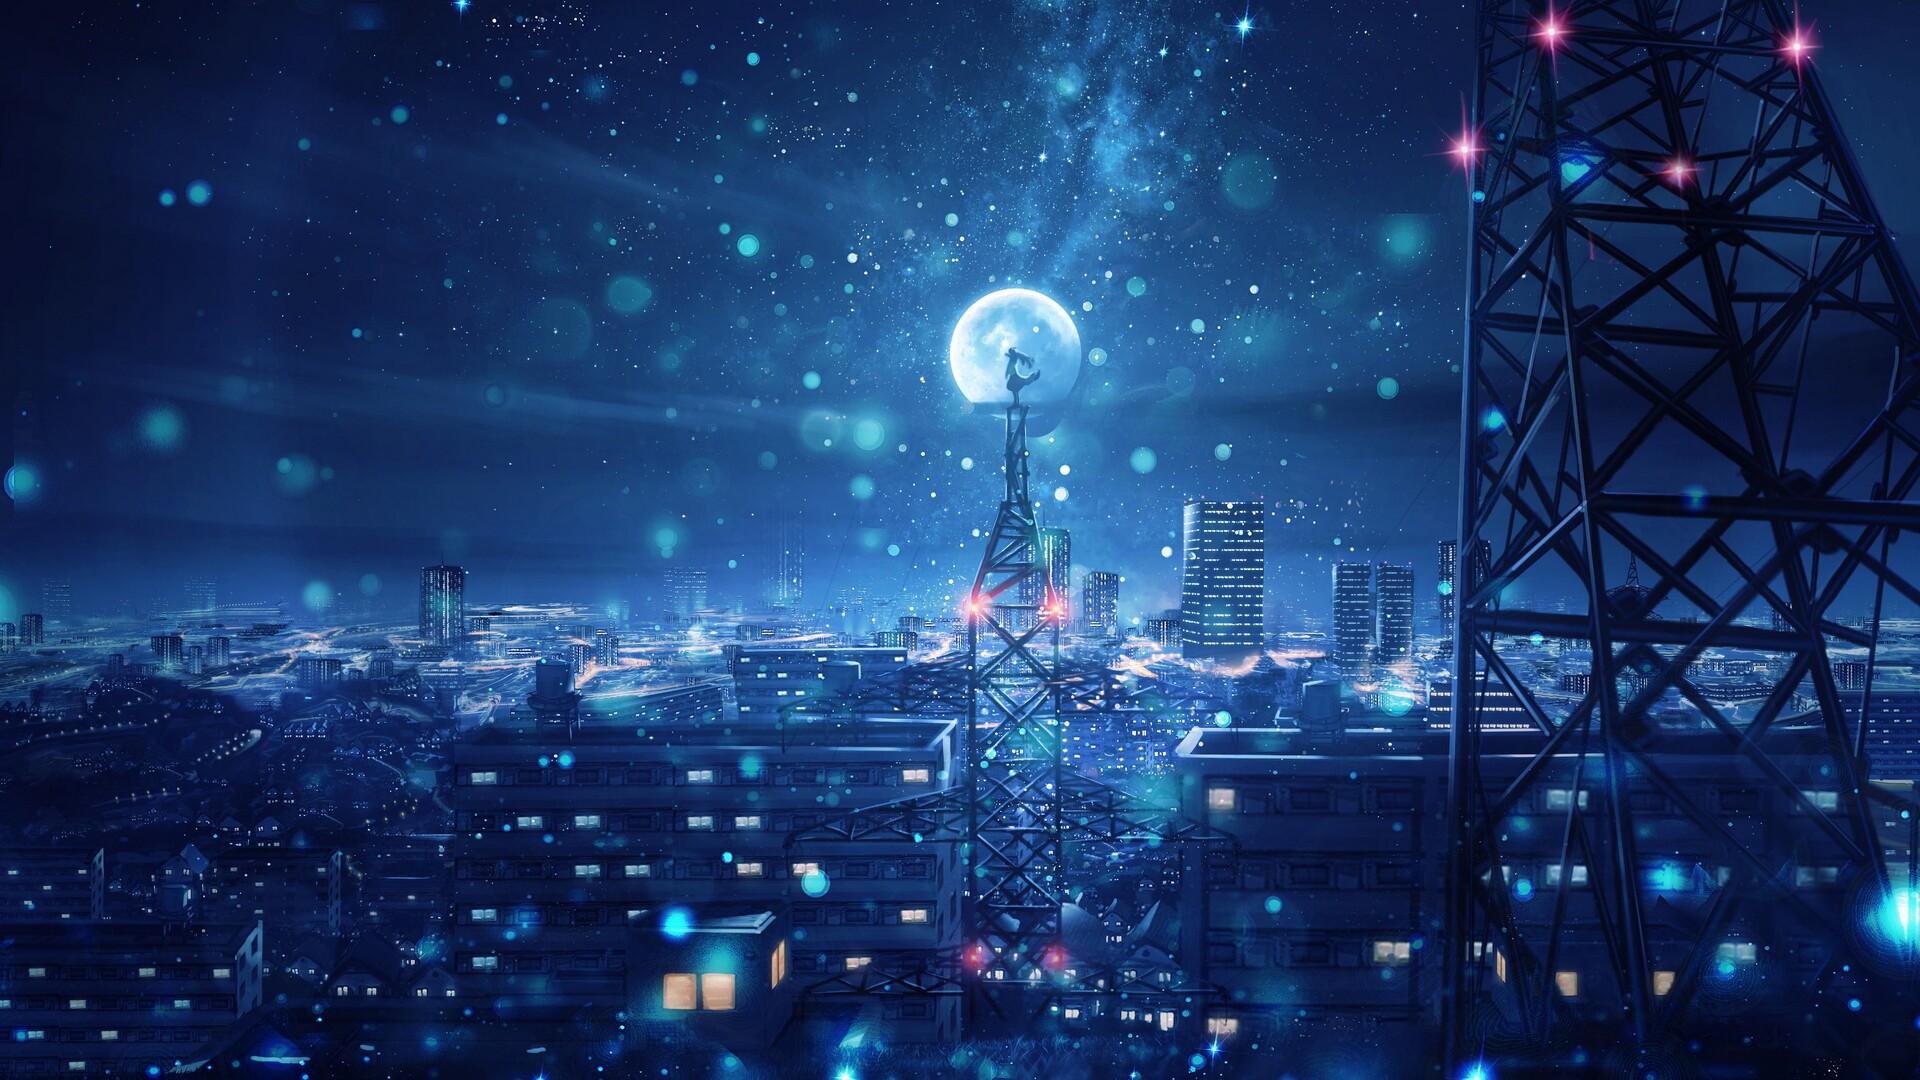 1920x1080 blue night big moon anime scenery 4k laptop full - Anime background wallpaper 4k ...